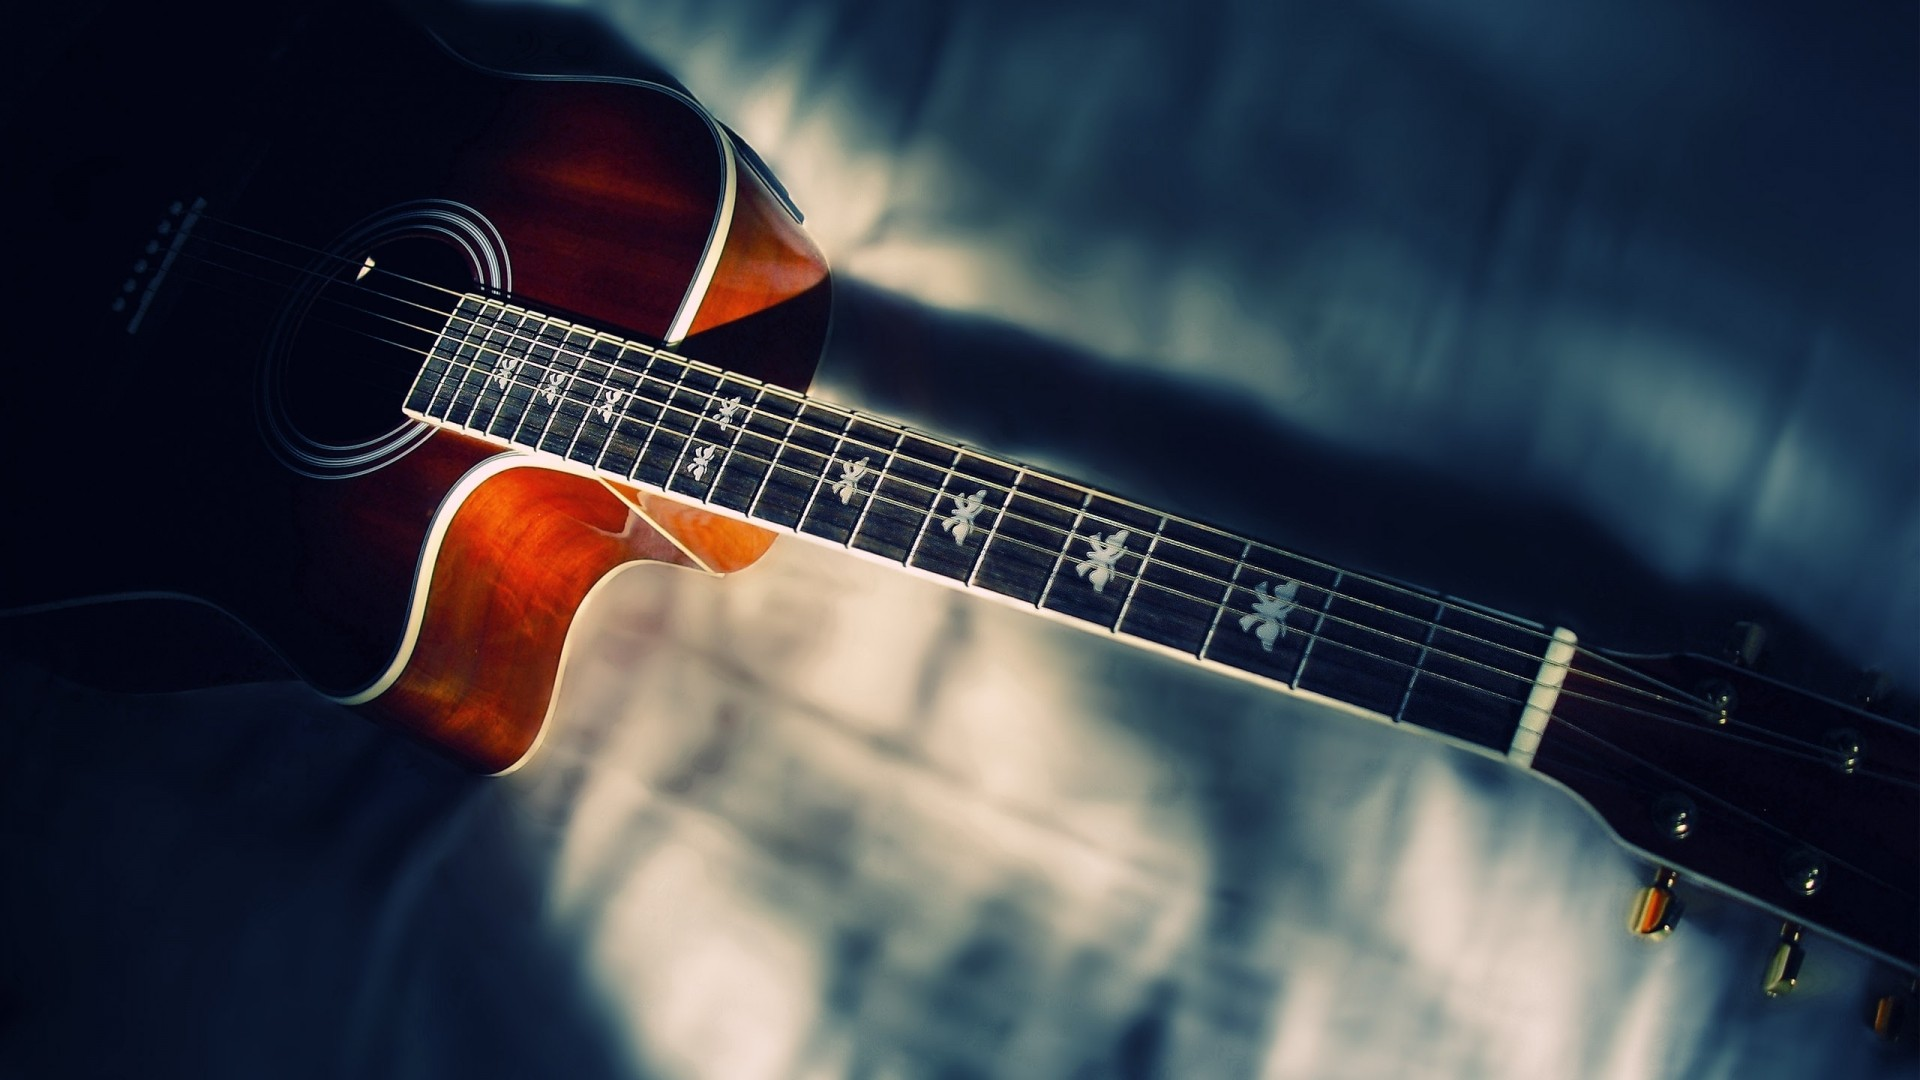 40+] Acoustic Guitar Wallpaper High